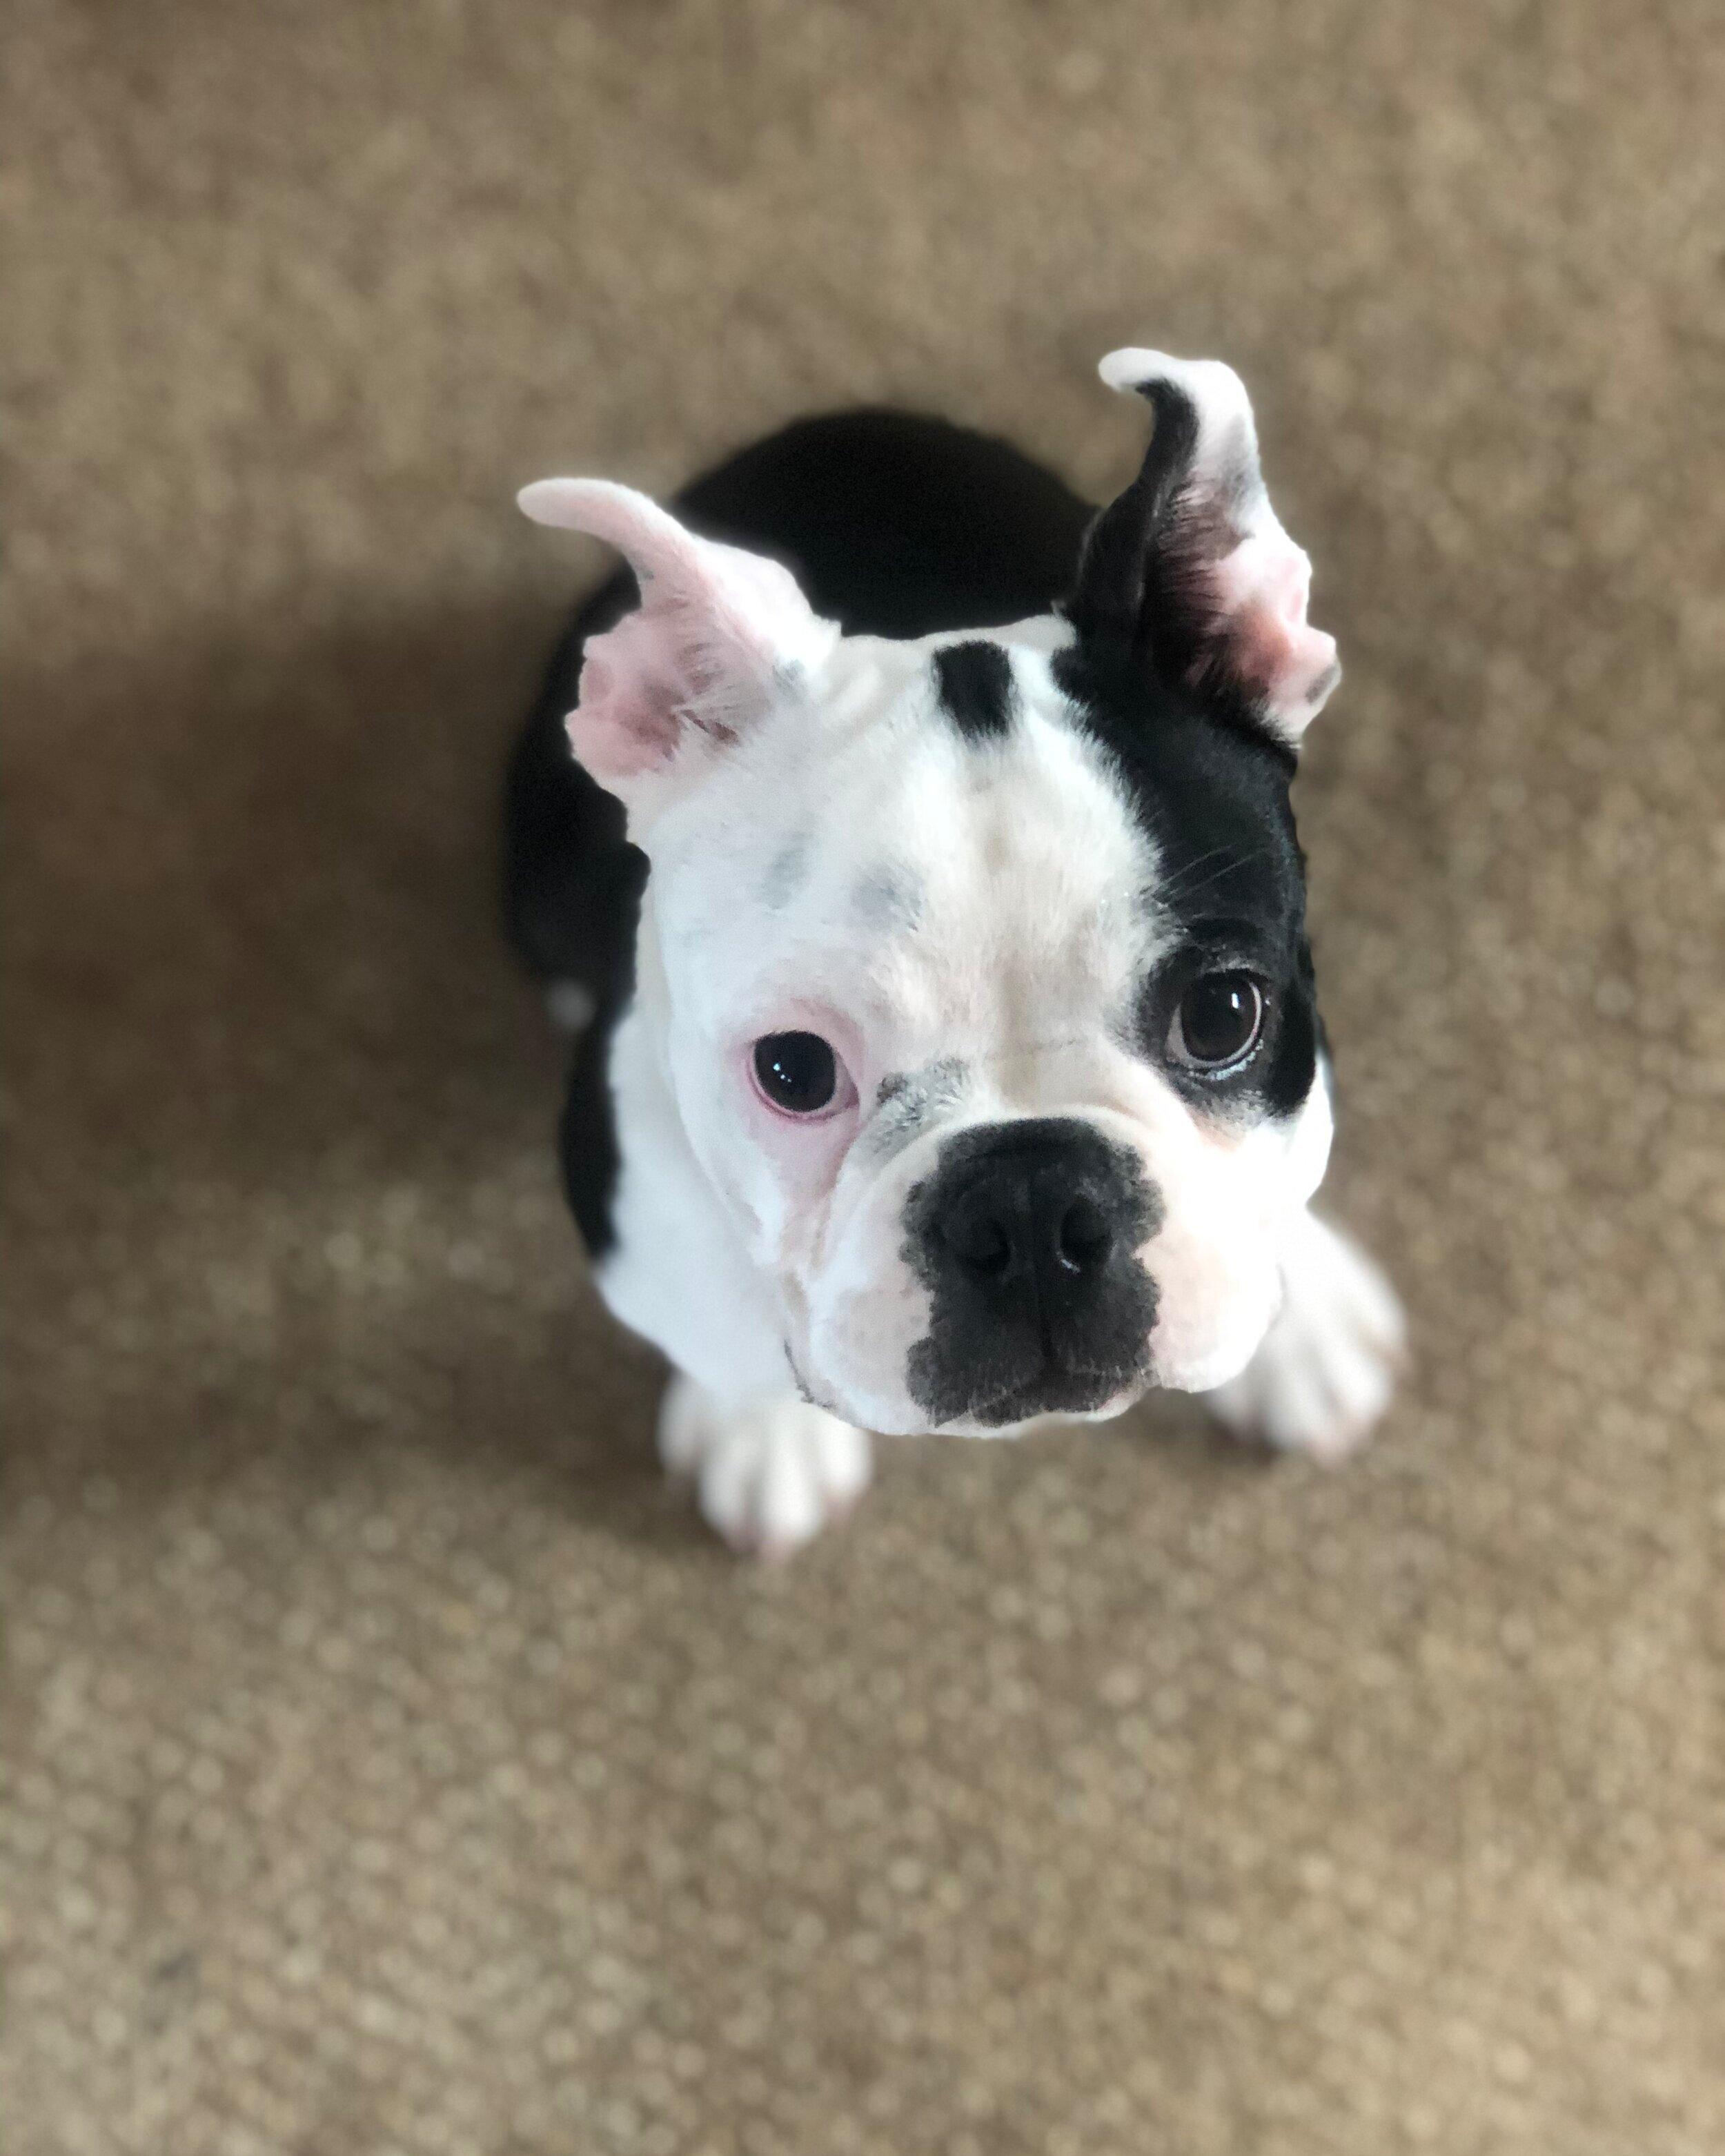 Pablo the Boston Terrier puppy